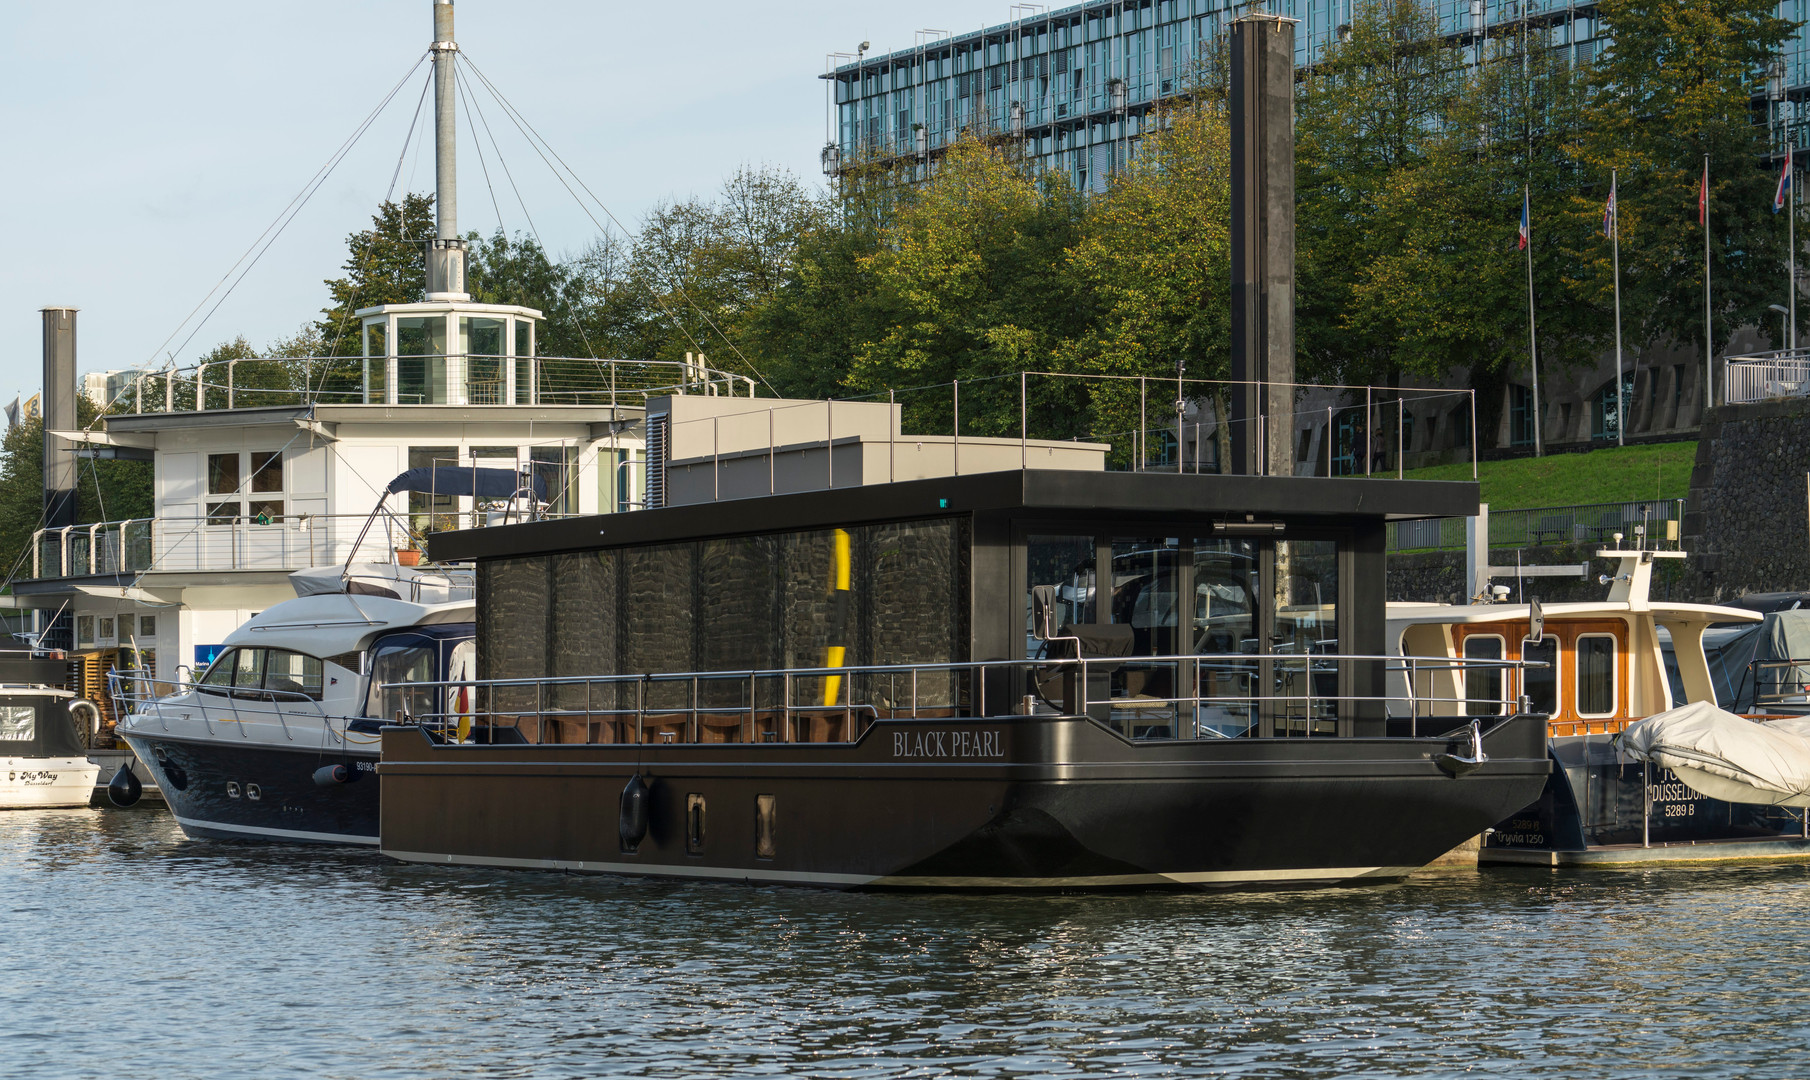 Cruising Home Hausboot - Black Pearl